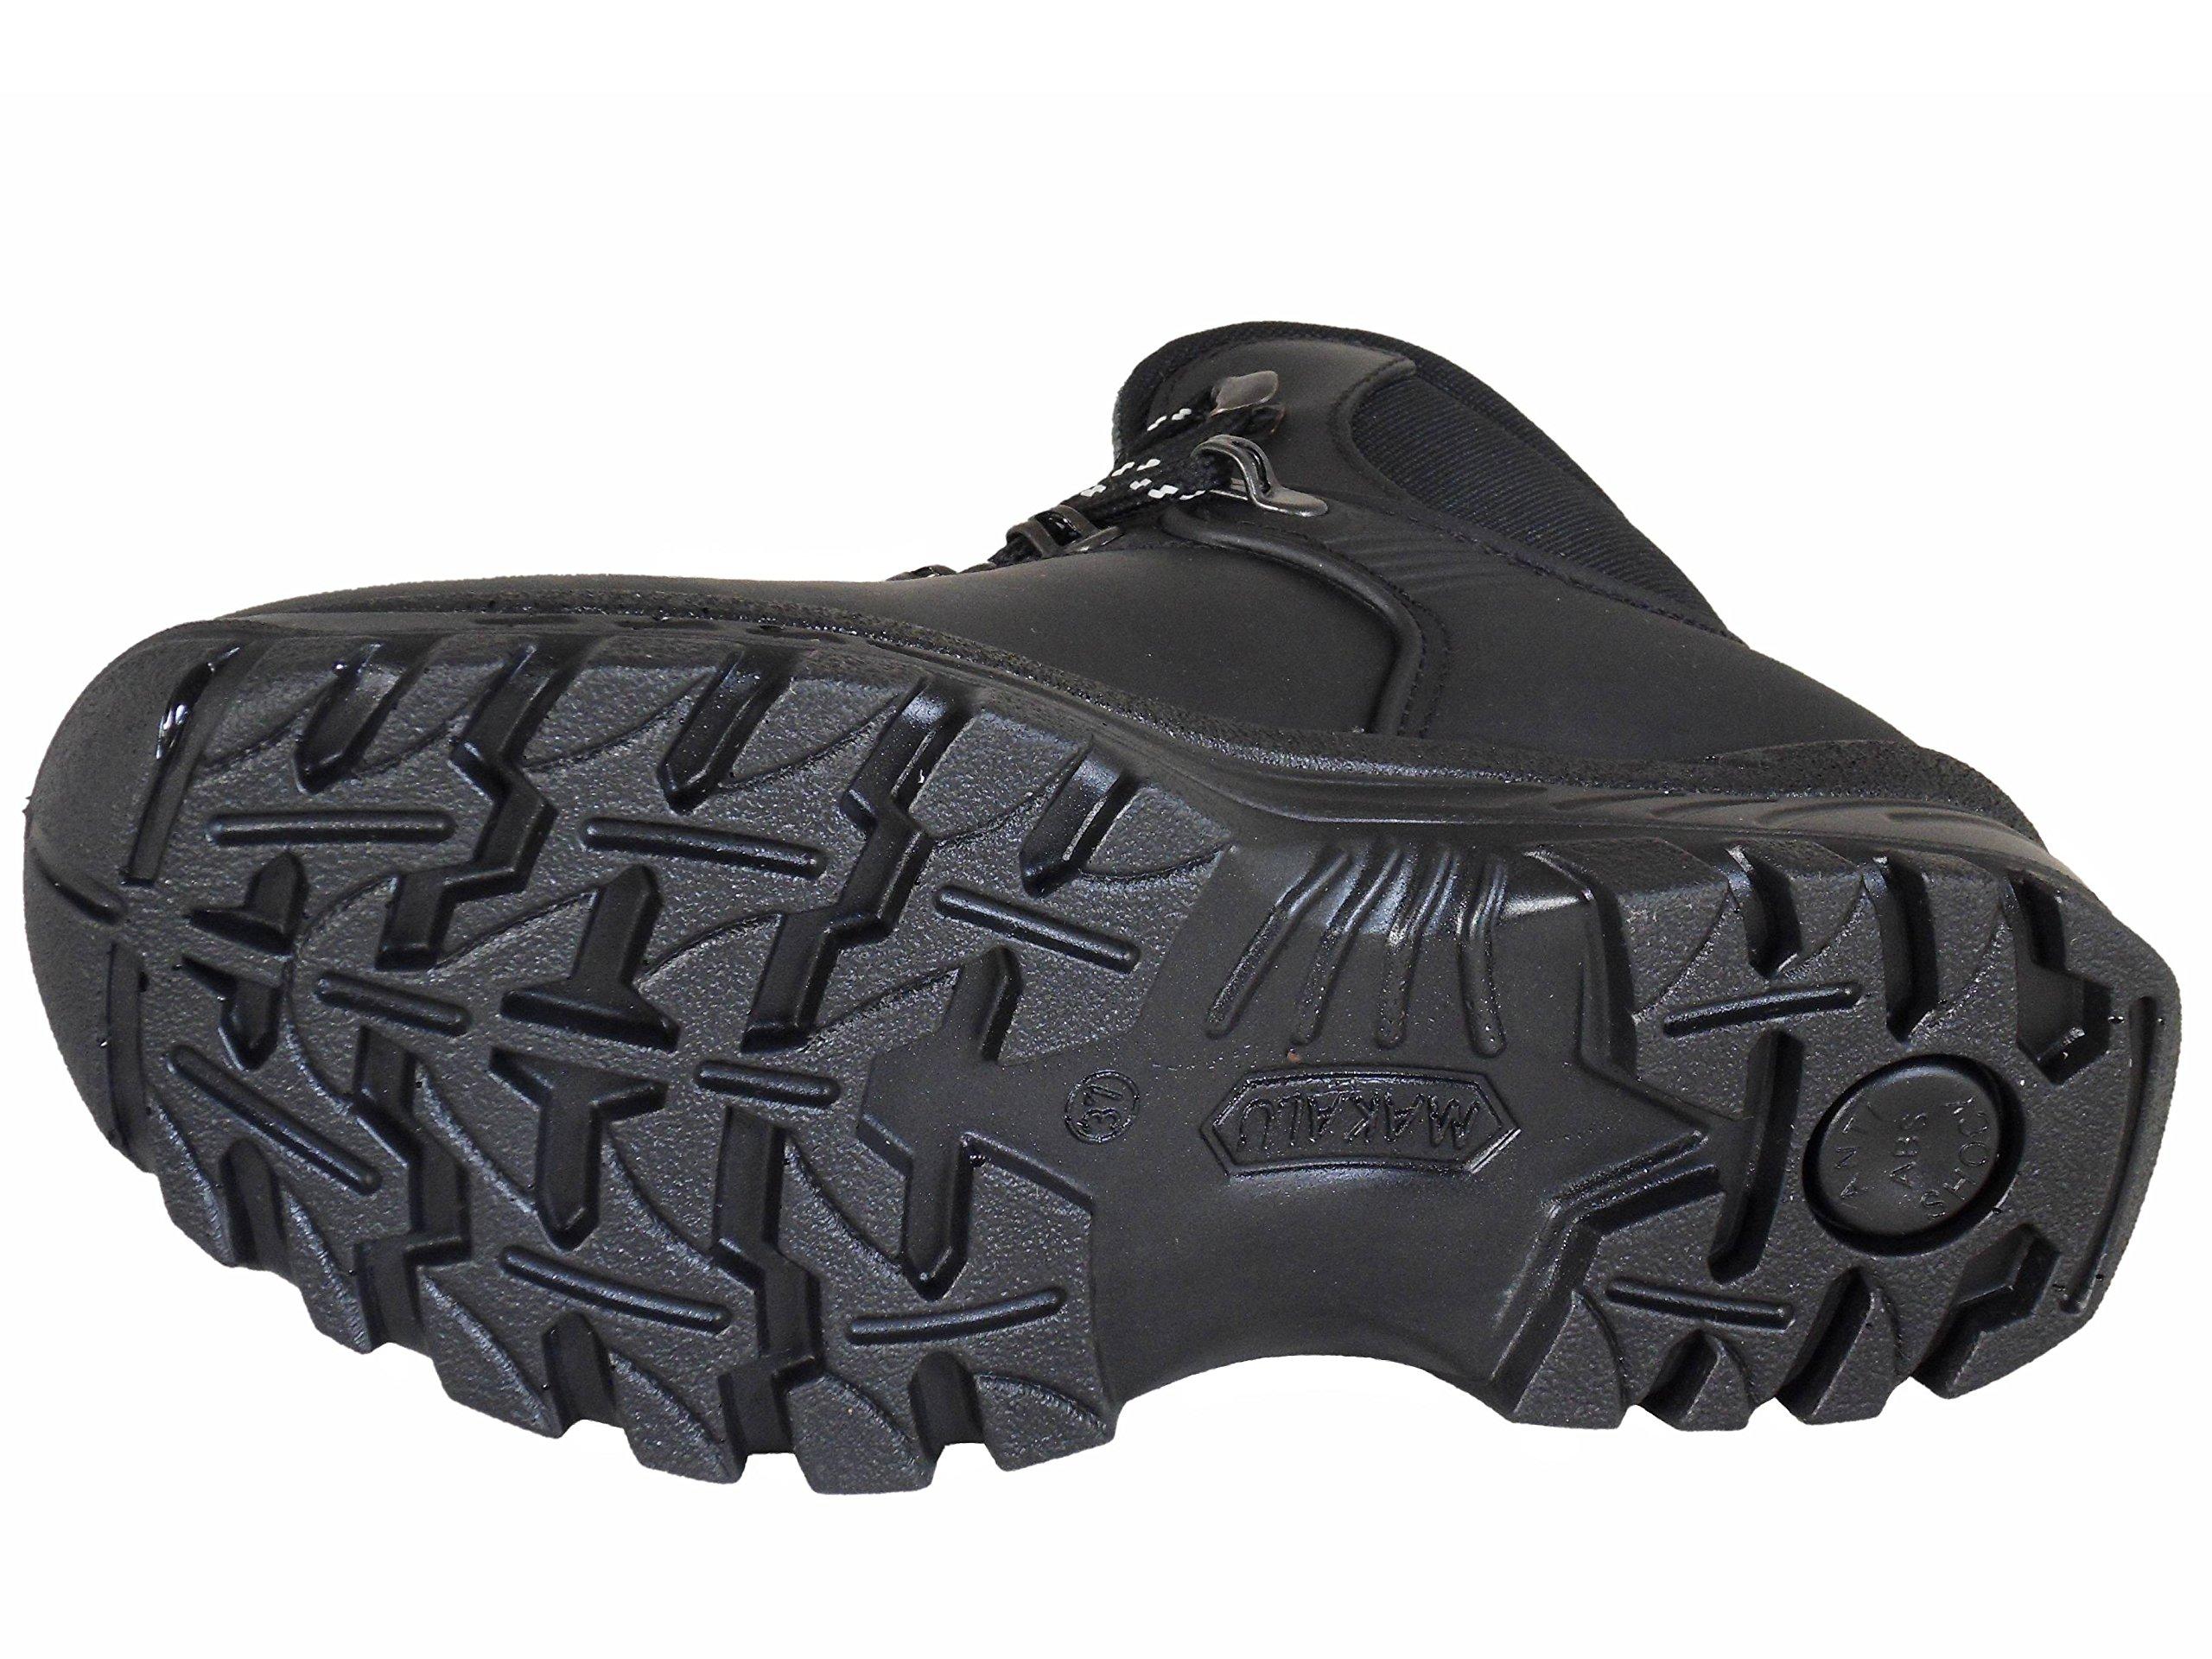 919kVAeBo8L - Grisport Explorer Ladies Lightweight Waterproof Walking Boots Black